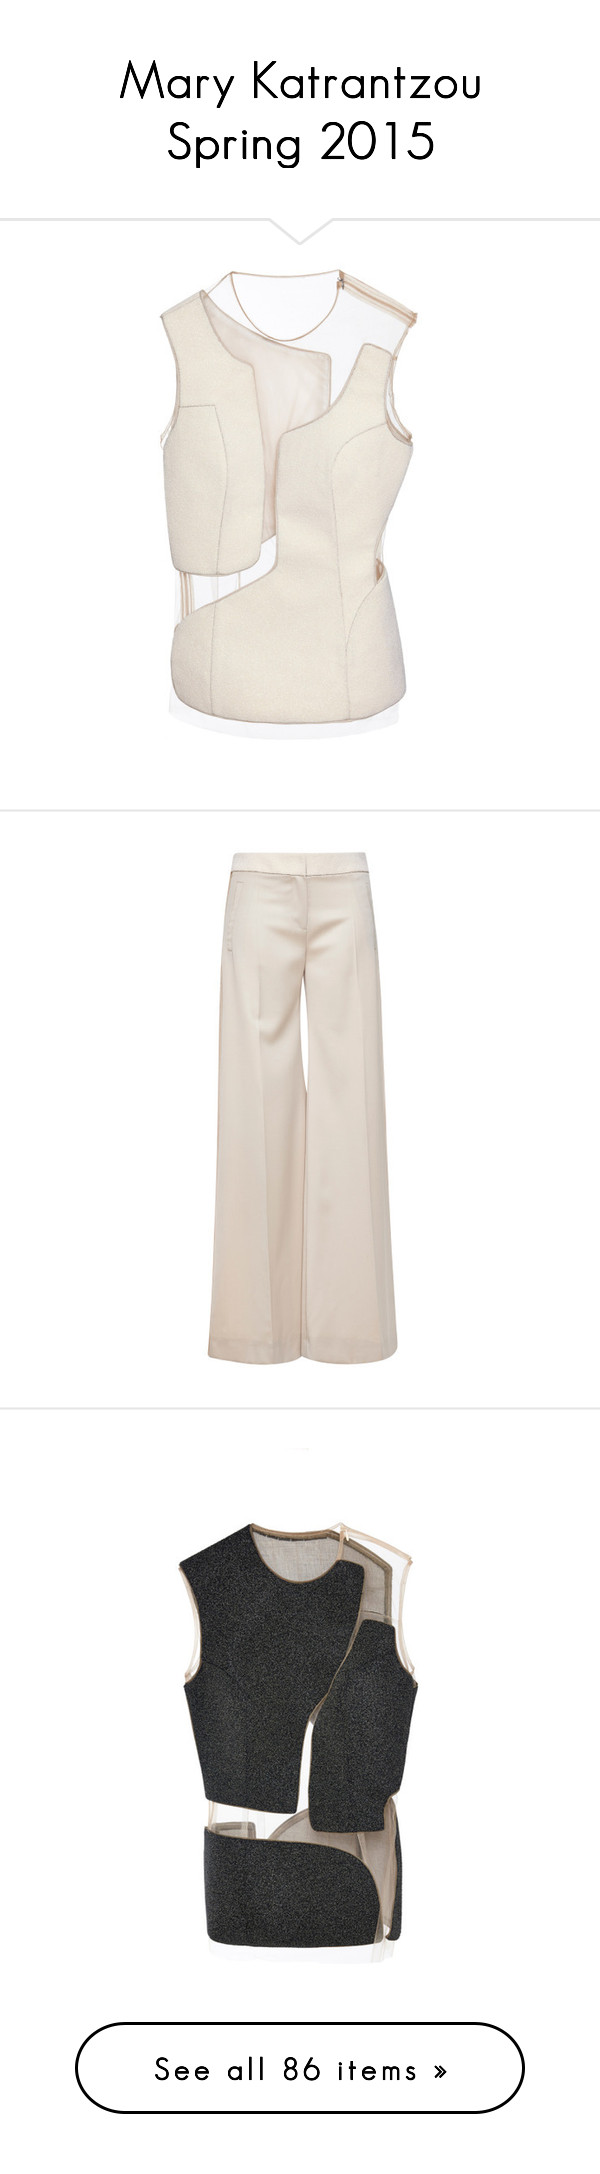 """Mary Katrantzou Spring 2015"" by naseebs ❤ liked on Polyvore featuring marykatrantzou, Spring2015, SS2015, tops, shirts, ivory, asymmetrical top, beaded top, sleeveless shirts and asymmetrical sleeveless tops"